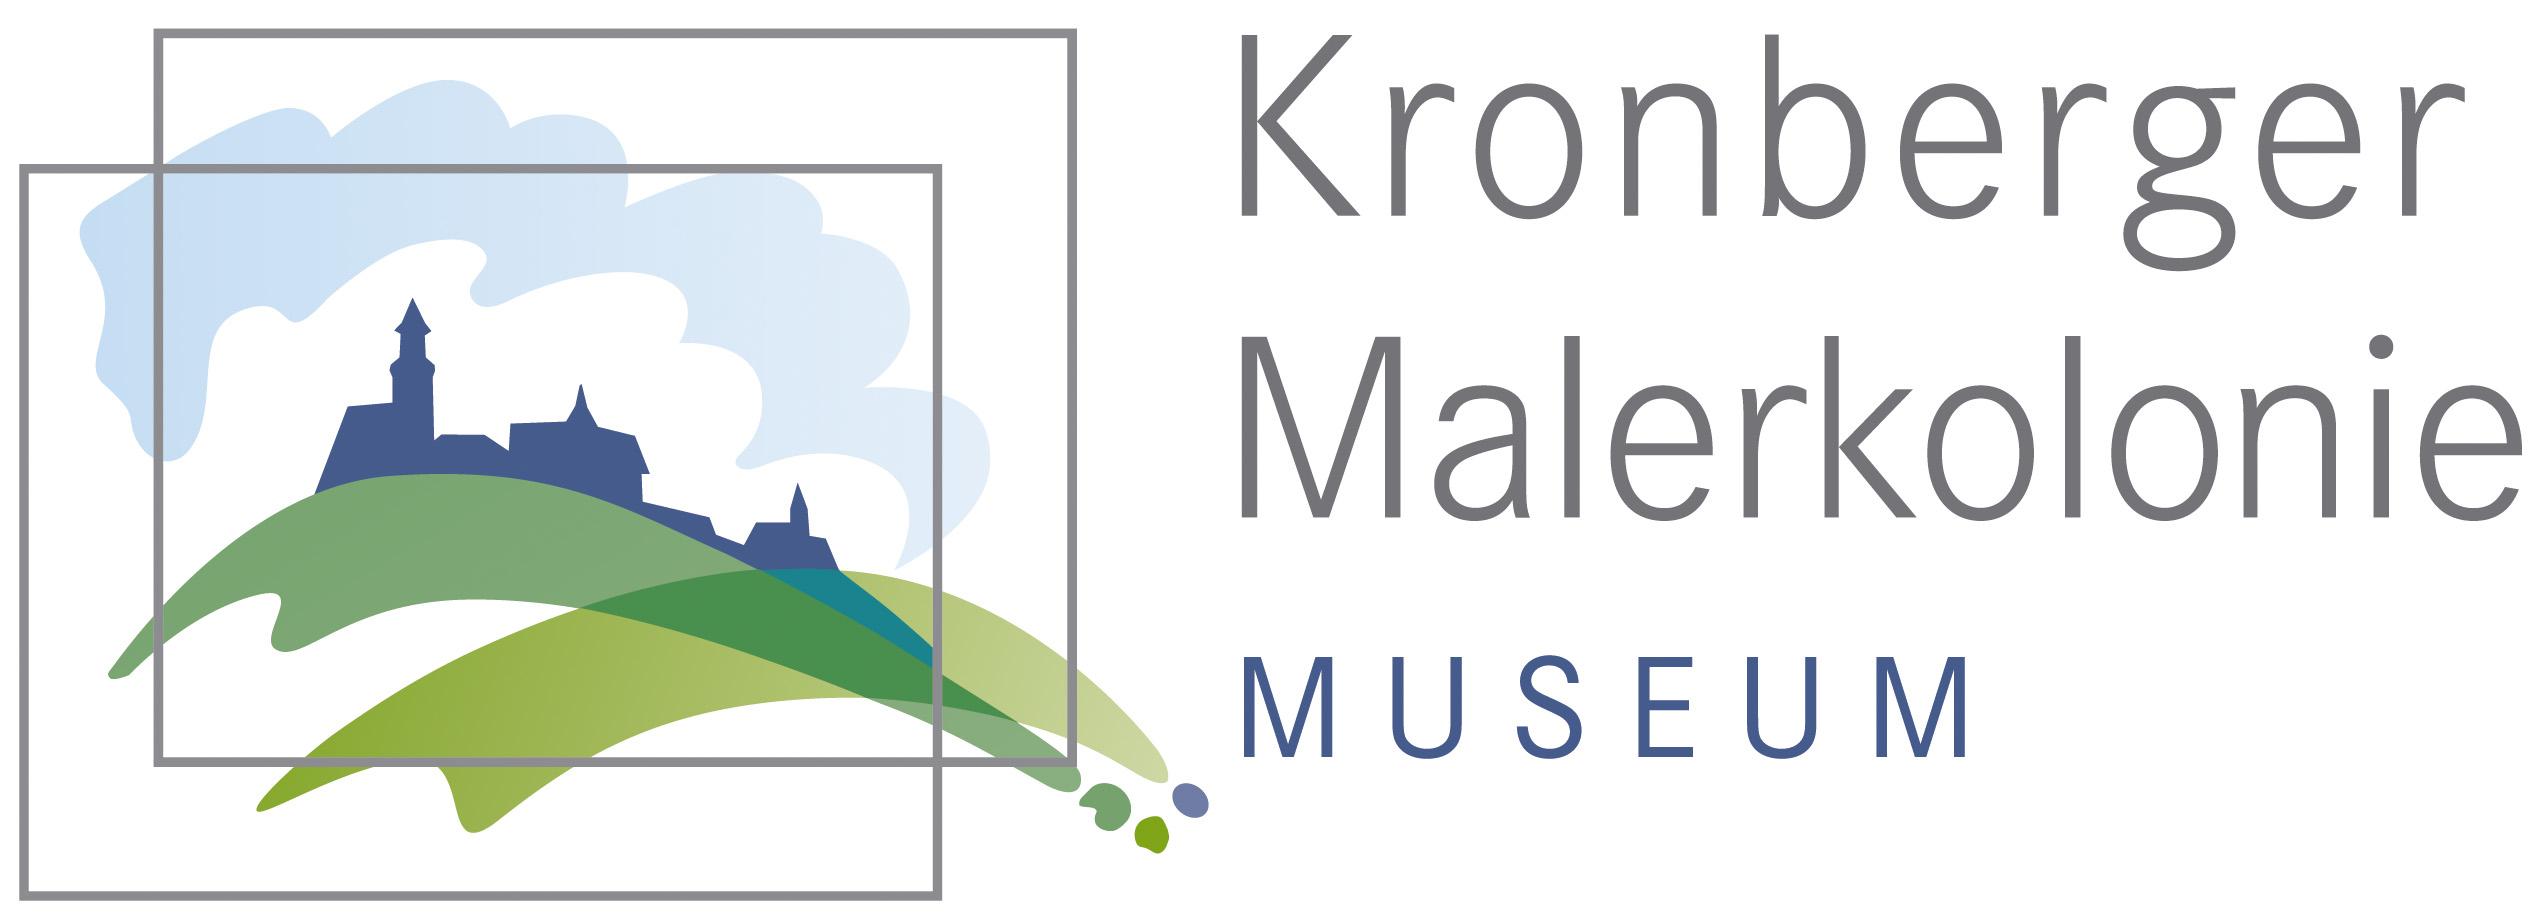 kronberger-malerkolonie_museum_4c-21cm_20140926_final